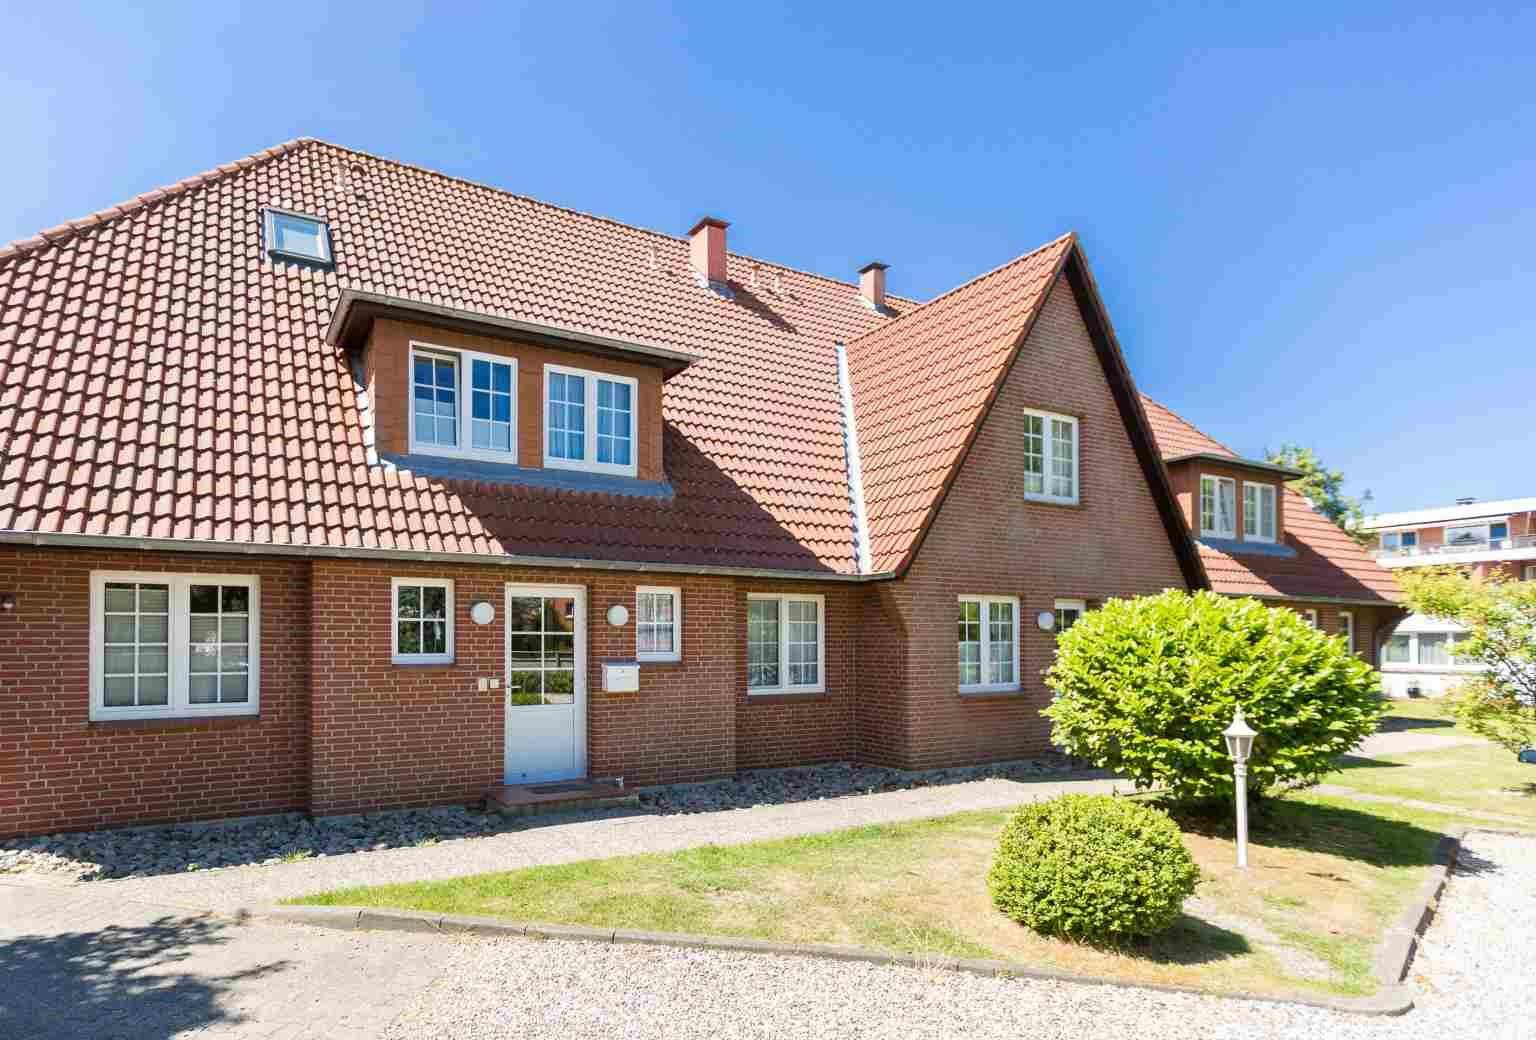 Aussenansicht Haus Nis Randers, Waldallee 20, St. Peter-Ording